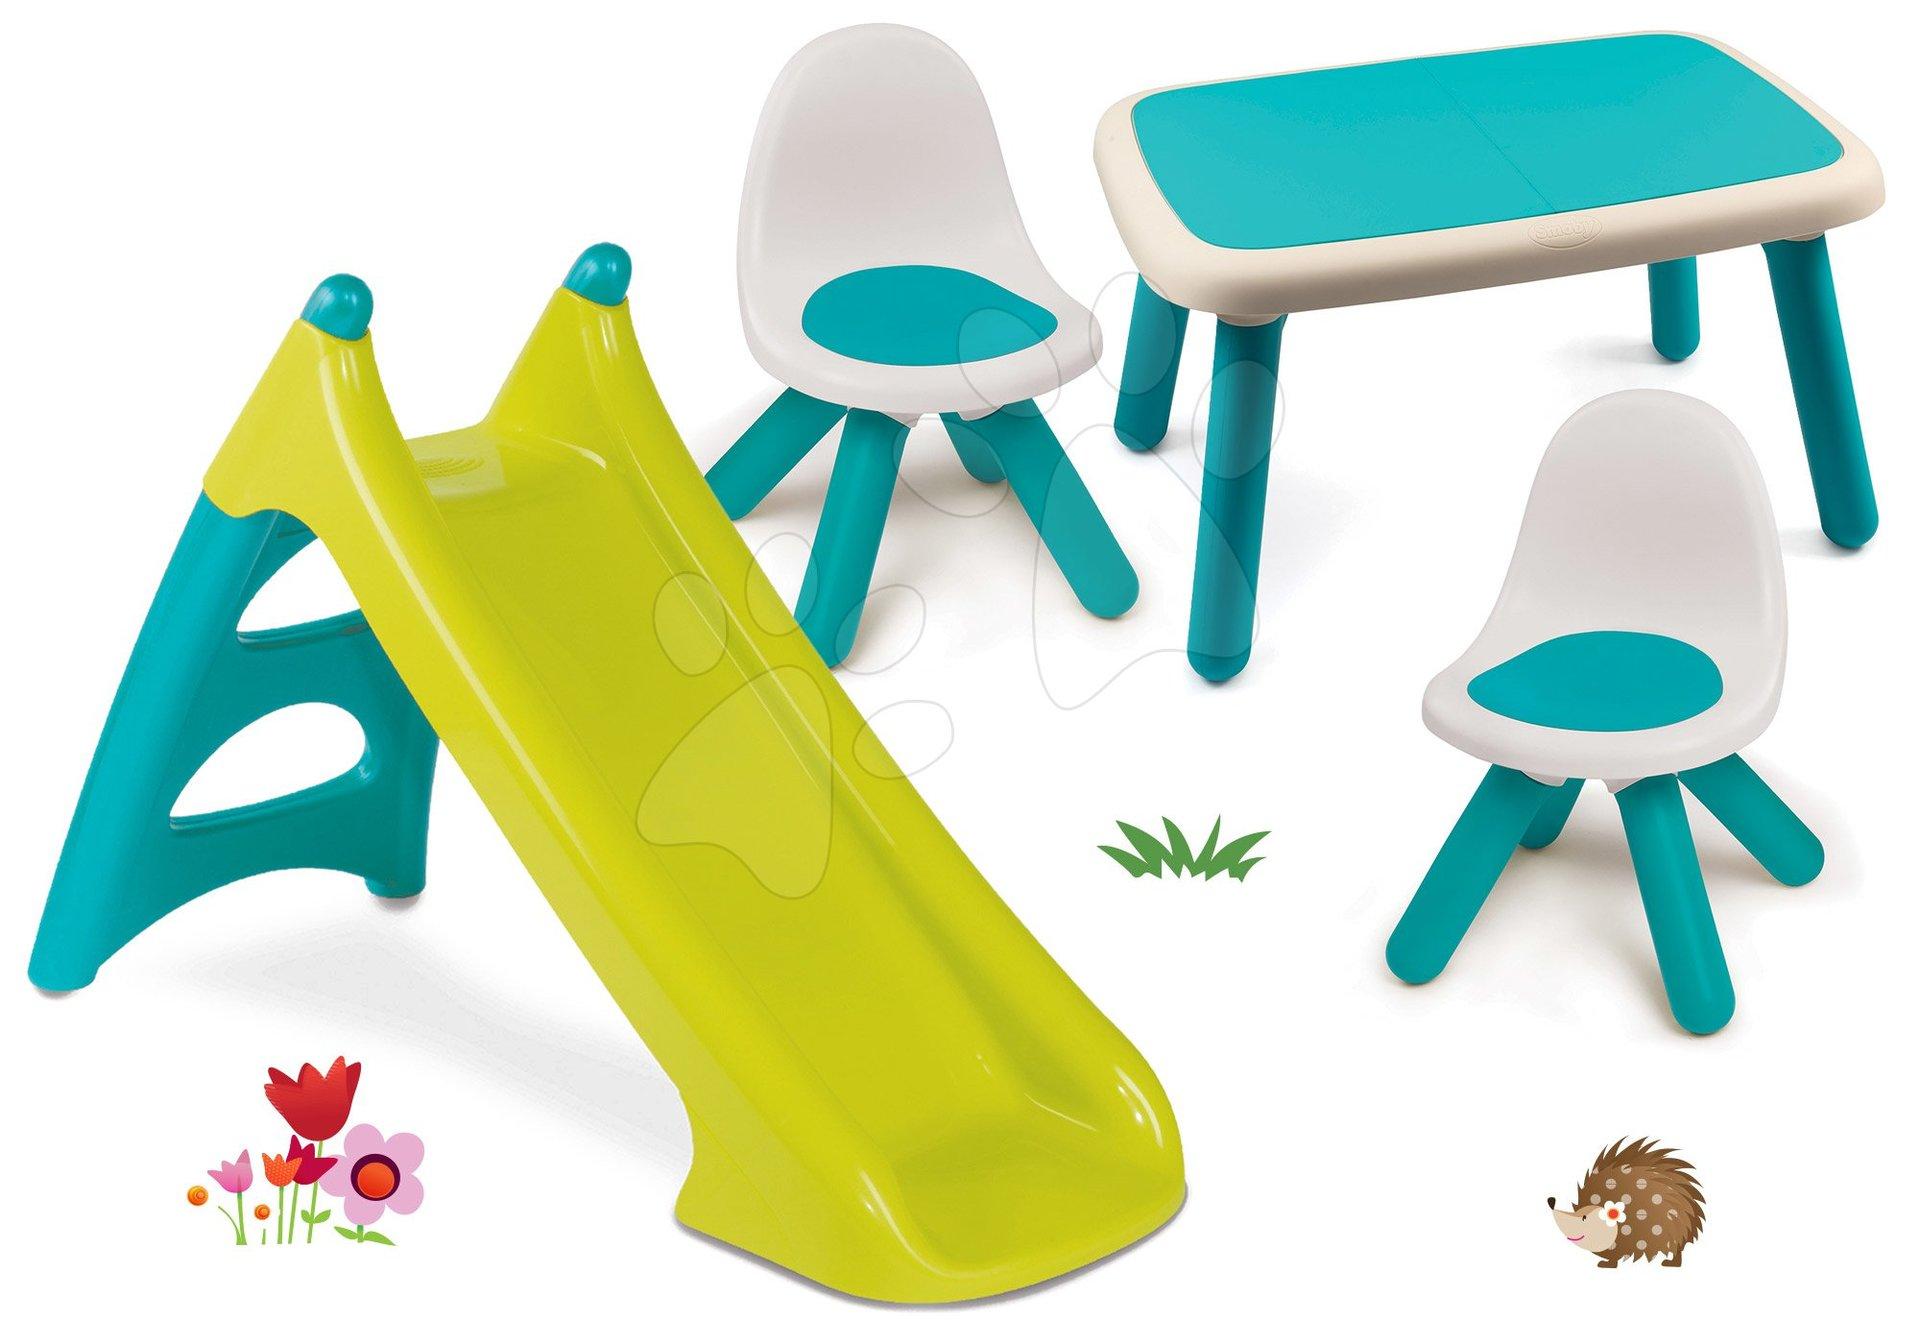 Set šmykľavka Toboggan XS modrá Smoby a stôl a dve stoličky KidChair